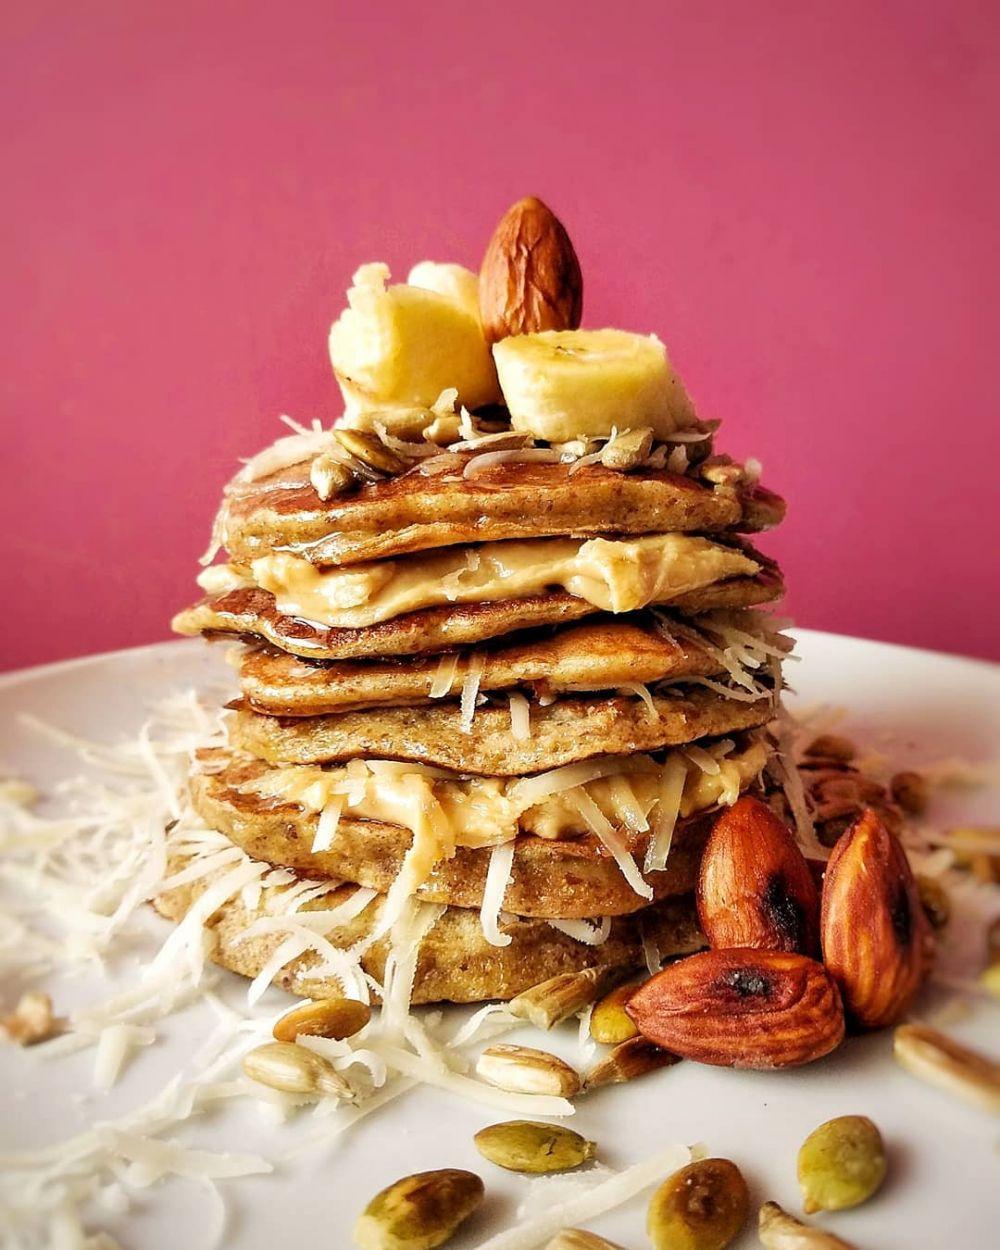 Resep menu sarapan sederhana Instagram